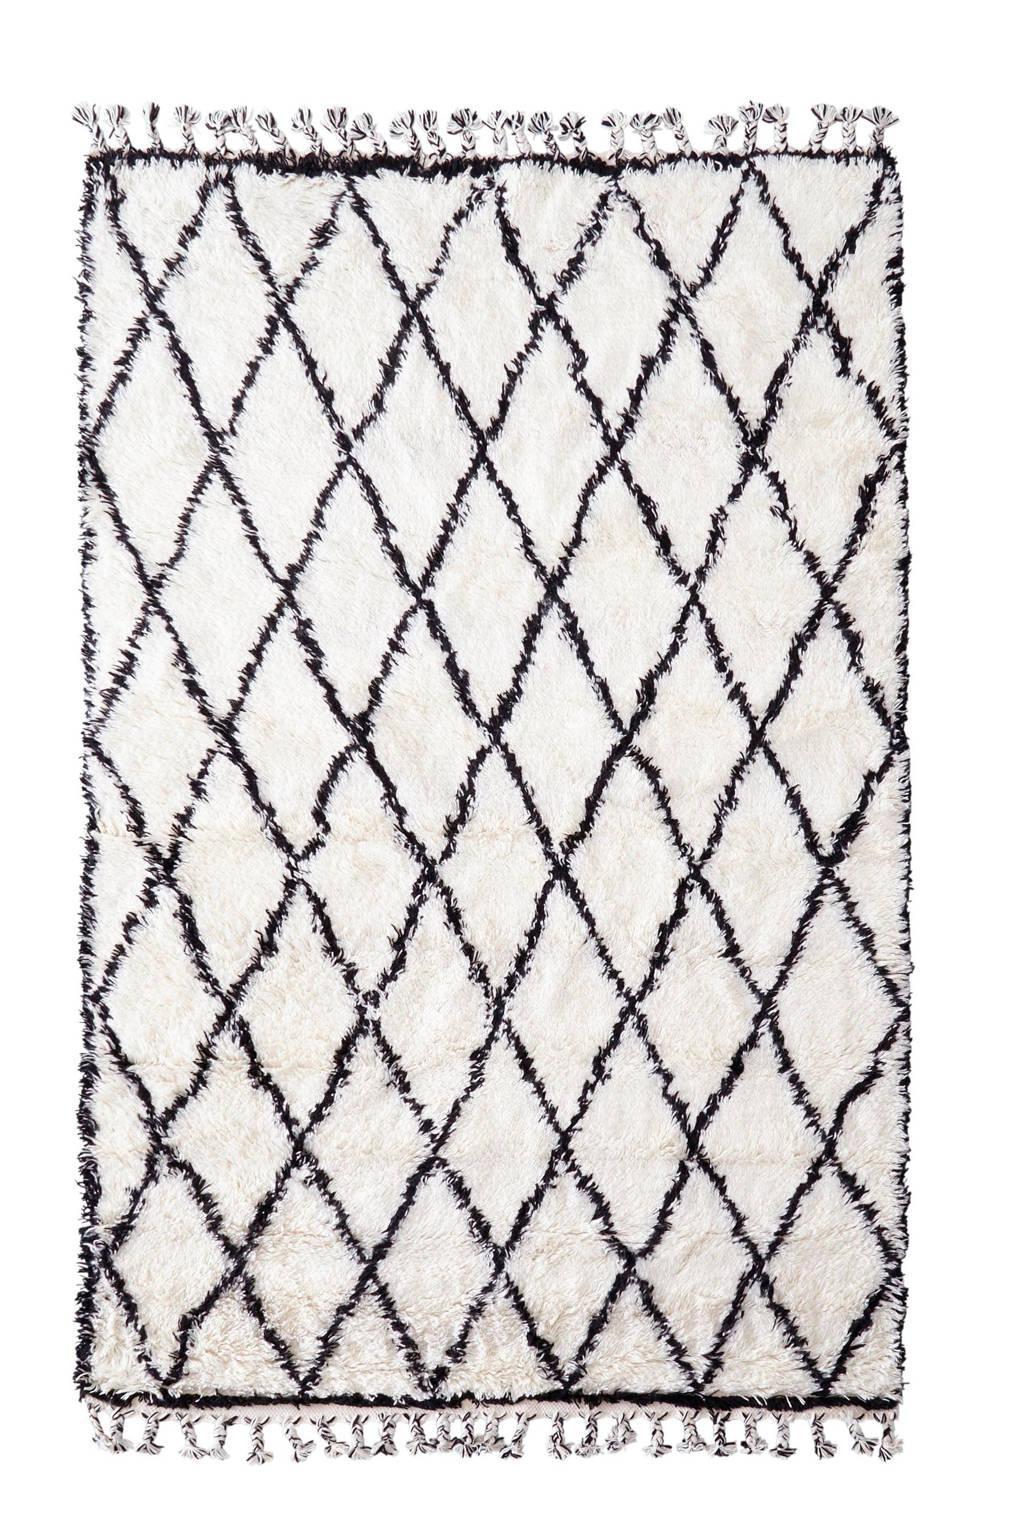 HKliving vloerkleed  (280x180 cm), Wit/zwart